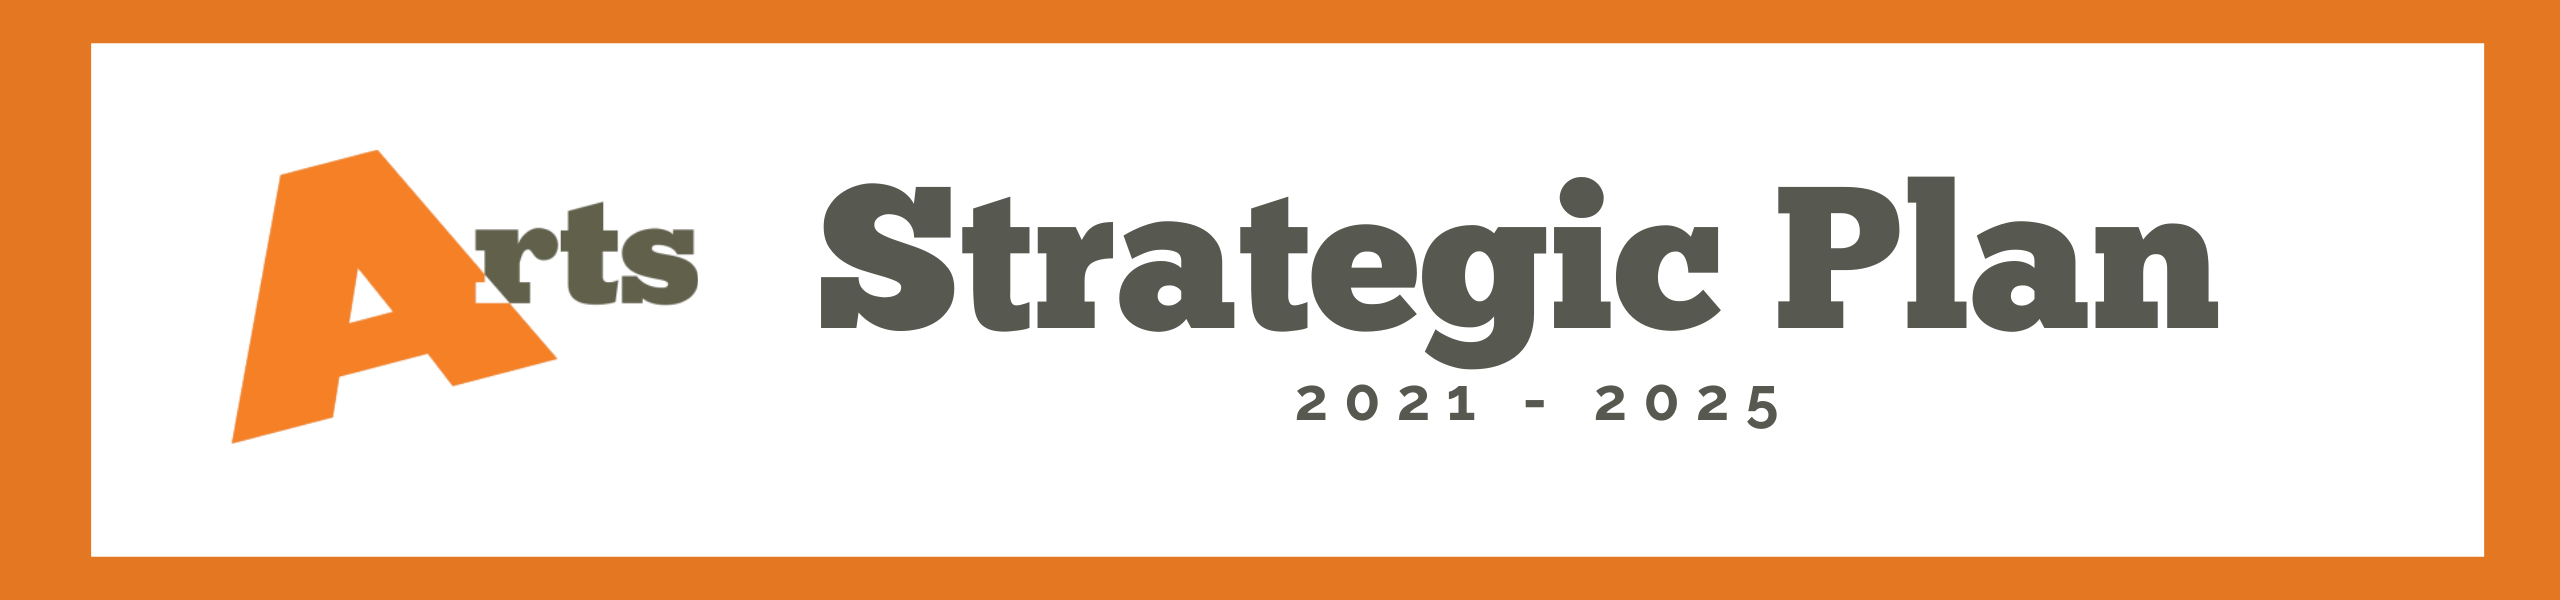 Strategic Planner Banner 2560x600